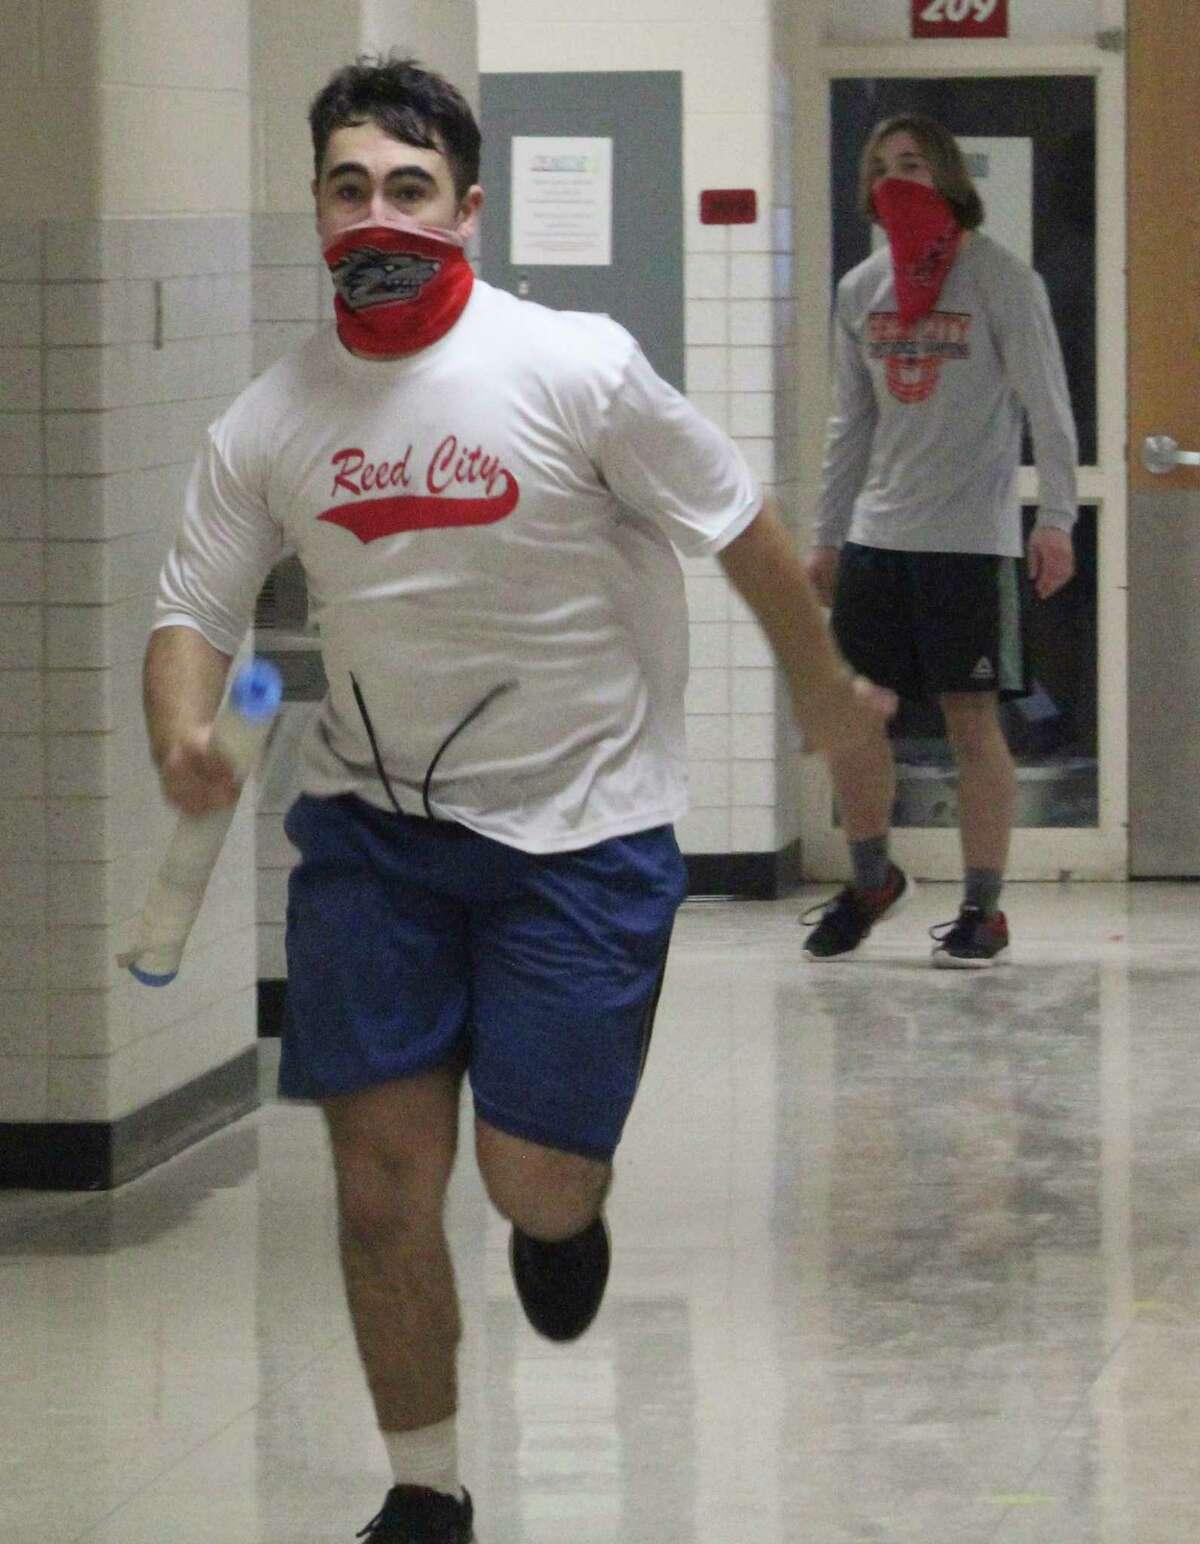 Reed City David Wayne runs through the hallway during wrestling practice last week. (Pioneer photo/John Raffel)